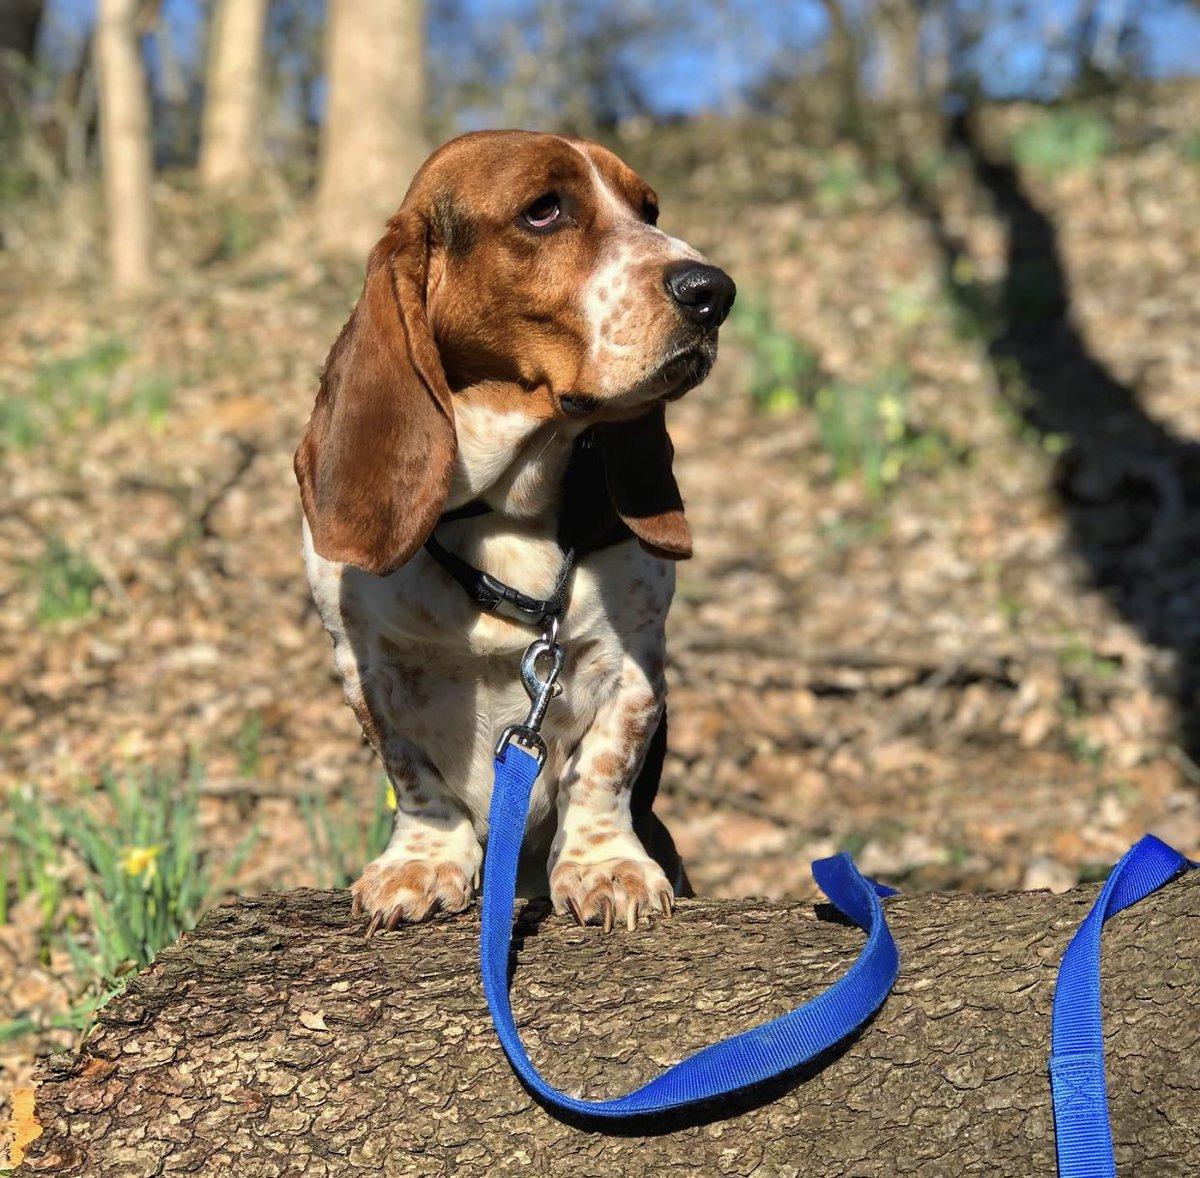 Today's a great day for an adventure! 🍂 #cincyparks #nature #getoutthere #autumn #weekend @CoastalPet #dog #dogs #woof #bark #ilovemydog #bassetworld #basset #bassets #bassethound #bassethounds #hounddog #puppy #cutie #puppylove #puppyeyes #cincinnati #dogsofcincy #ohio #explore